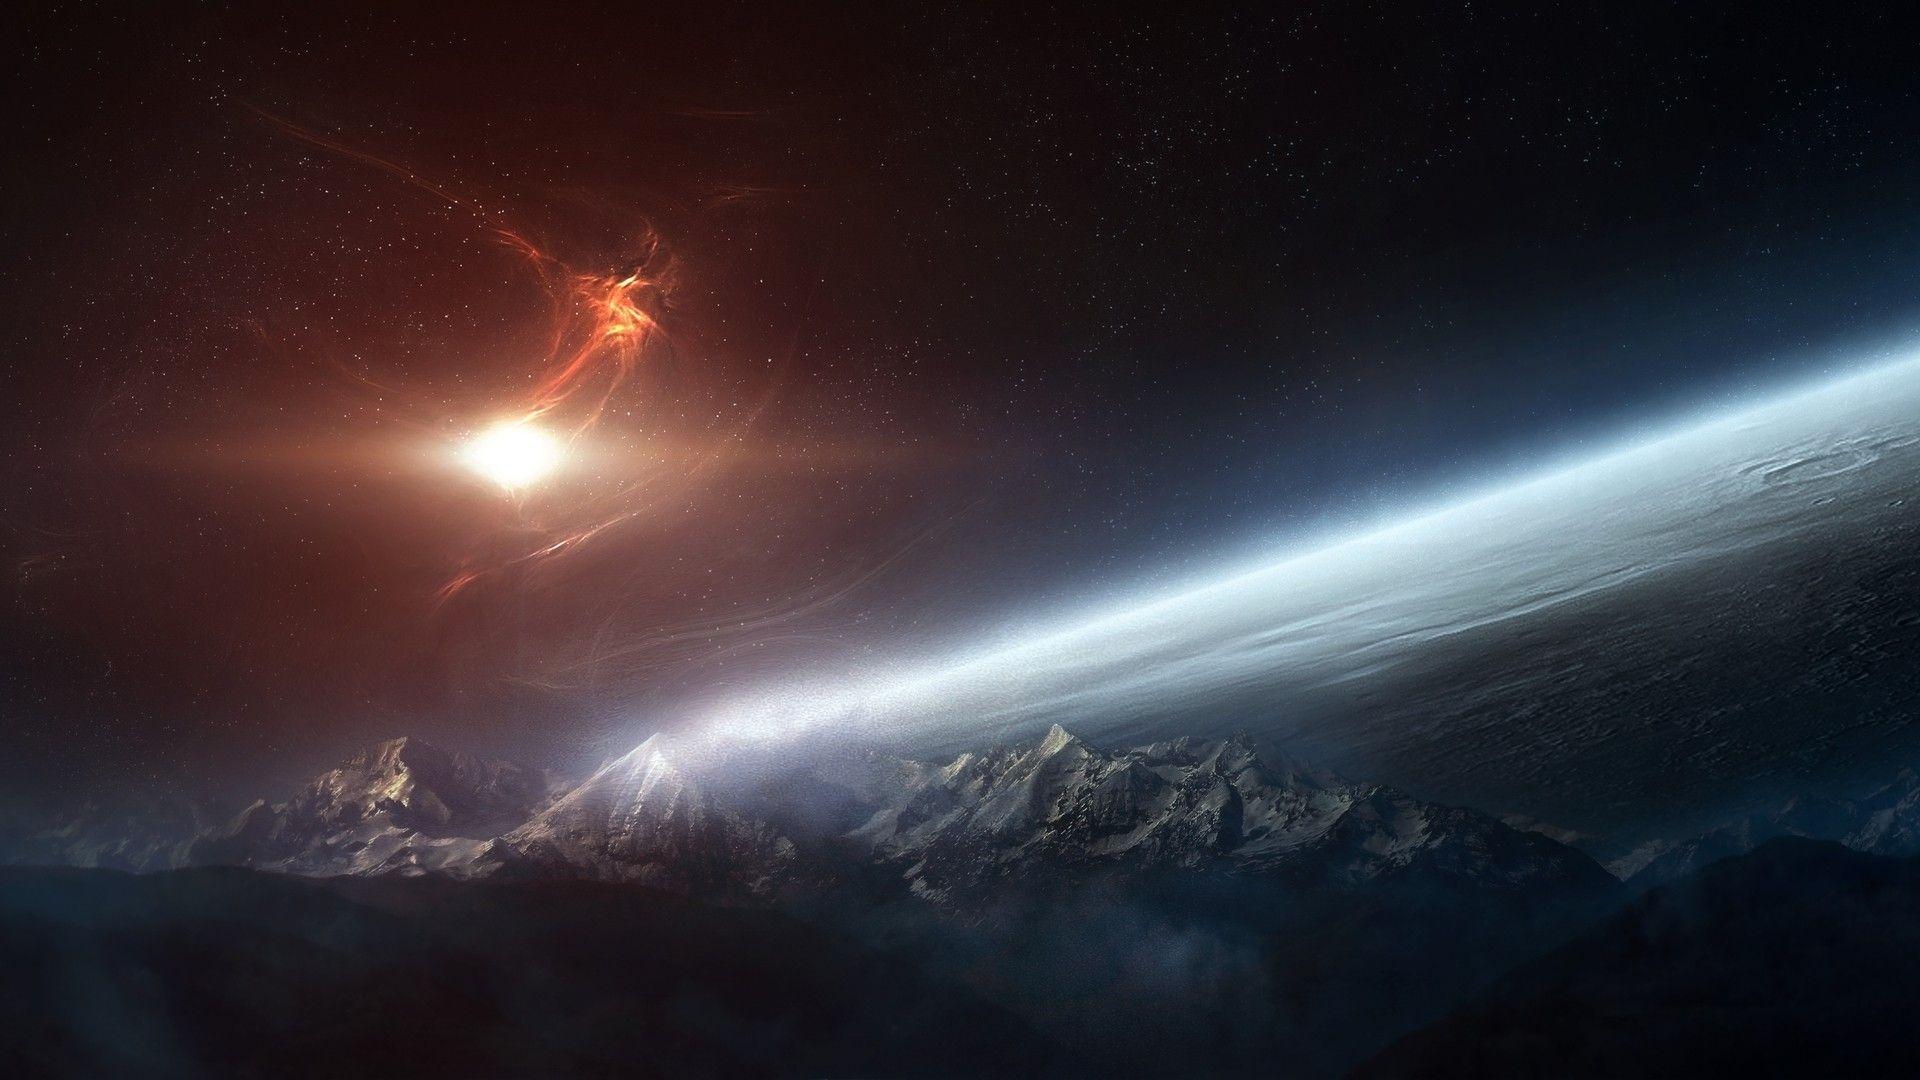 space wallpaper |  outer space hd wallpaper » fullhdwpp - full hd